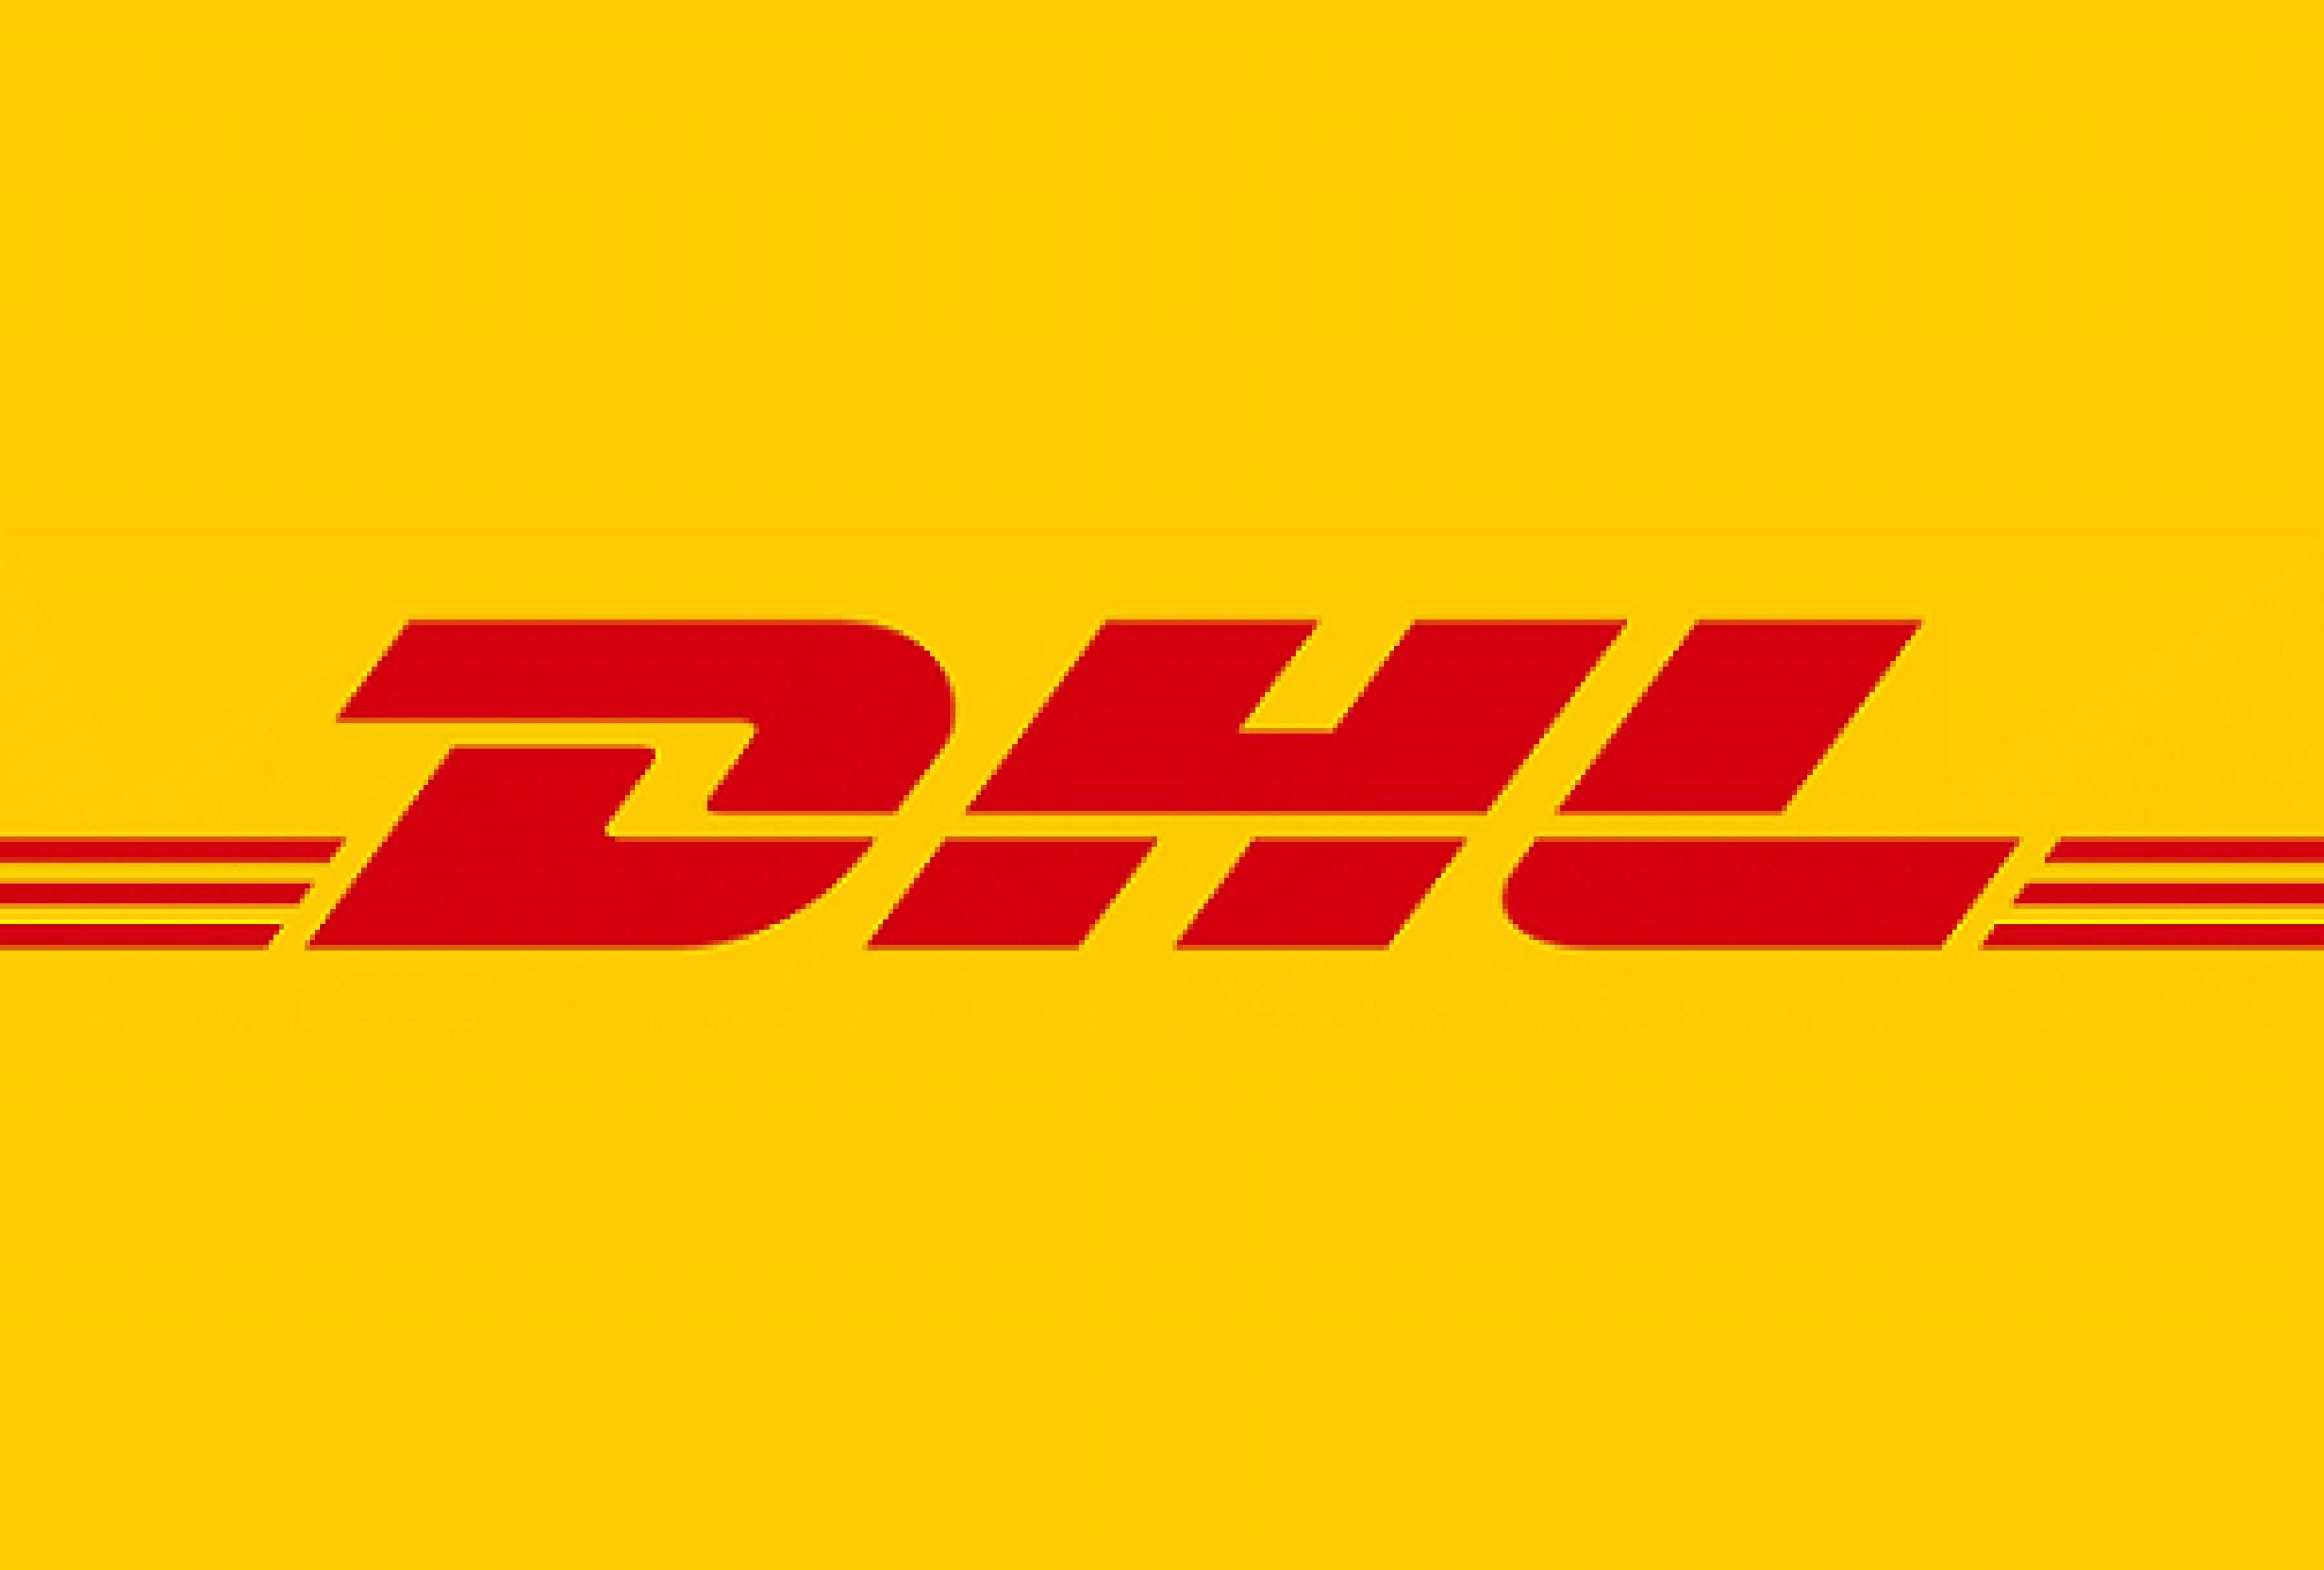 DHL Logo Wallpaper